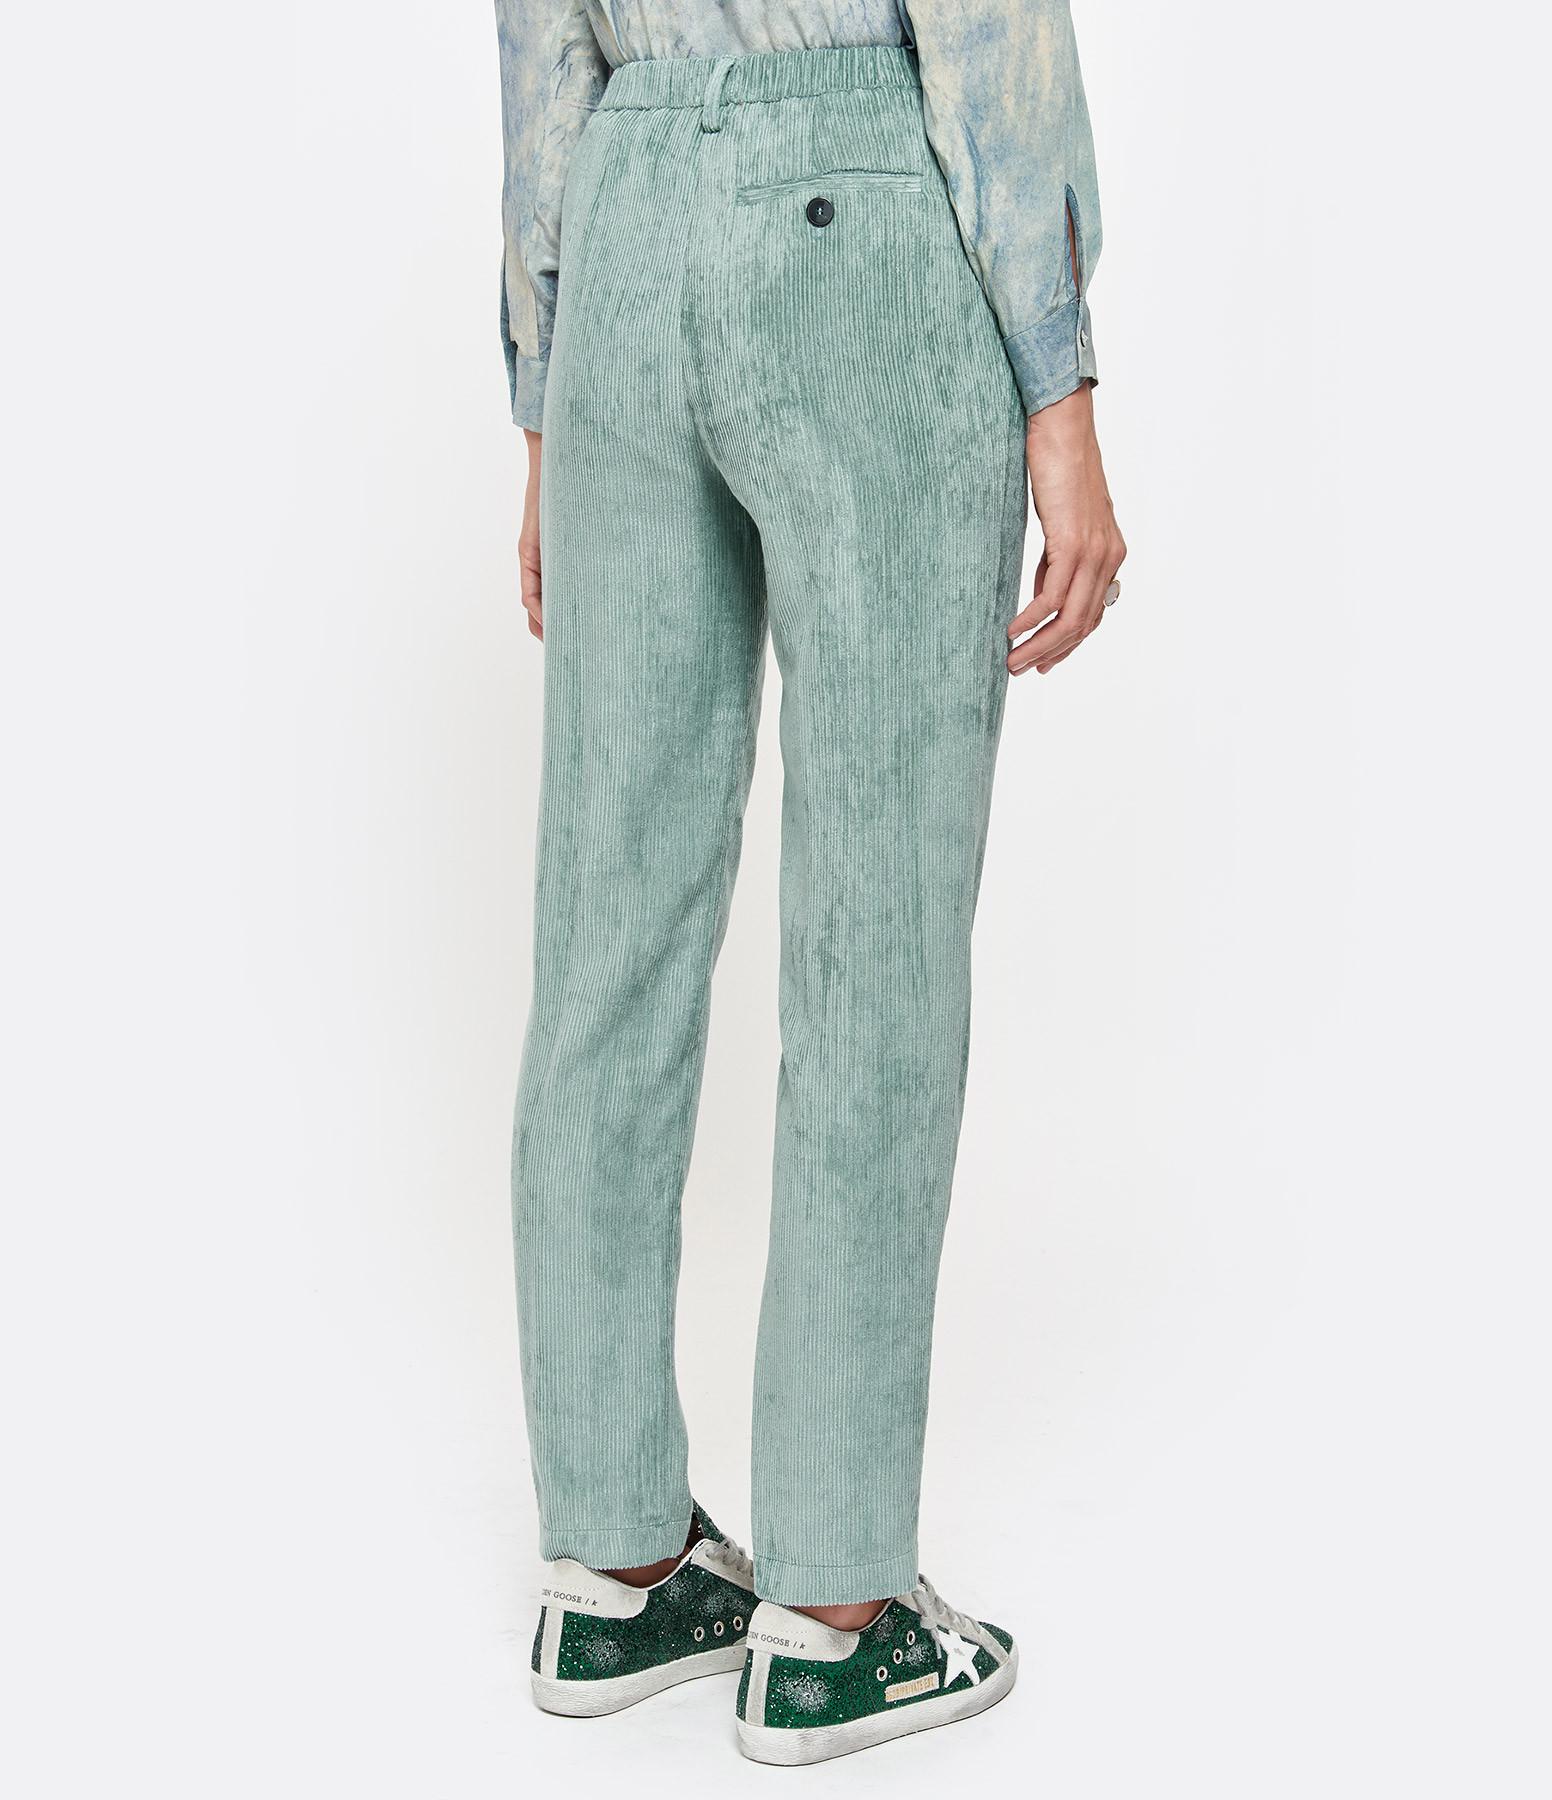 FORTE_FORTE - Pantalon Velours Fluide Bleu Marine